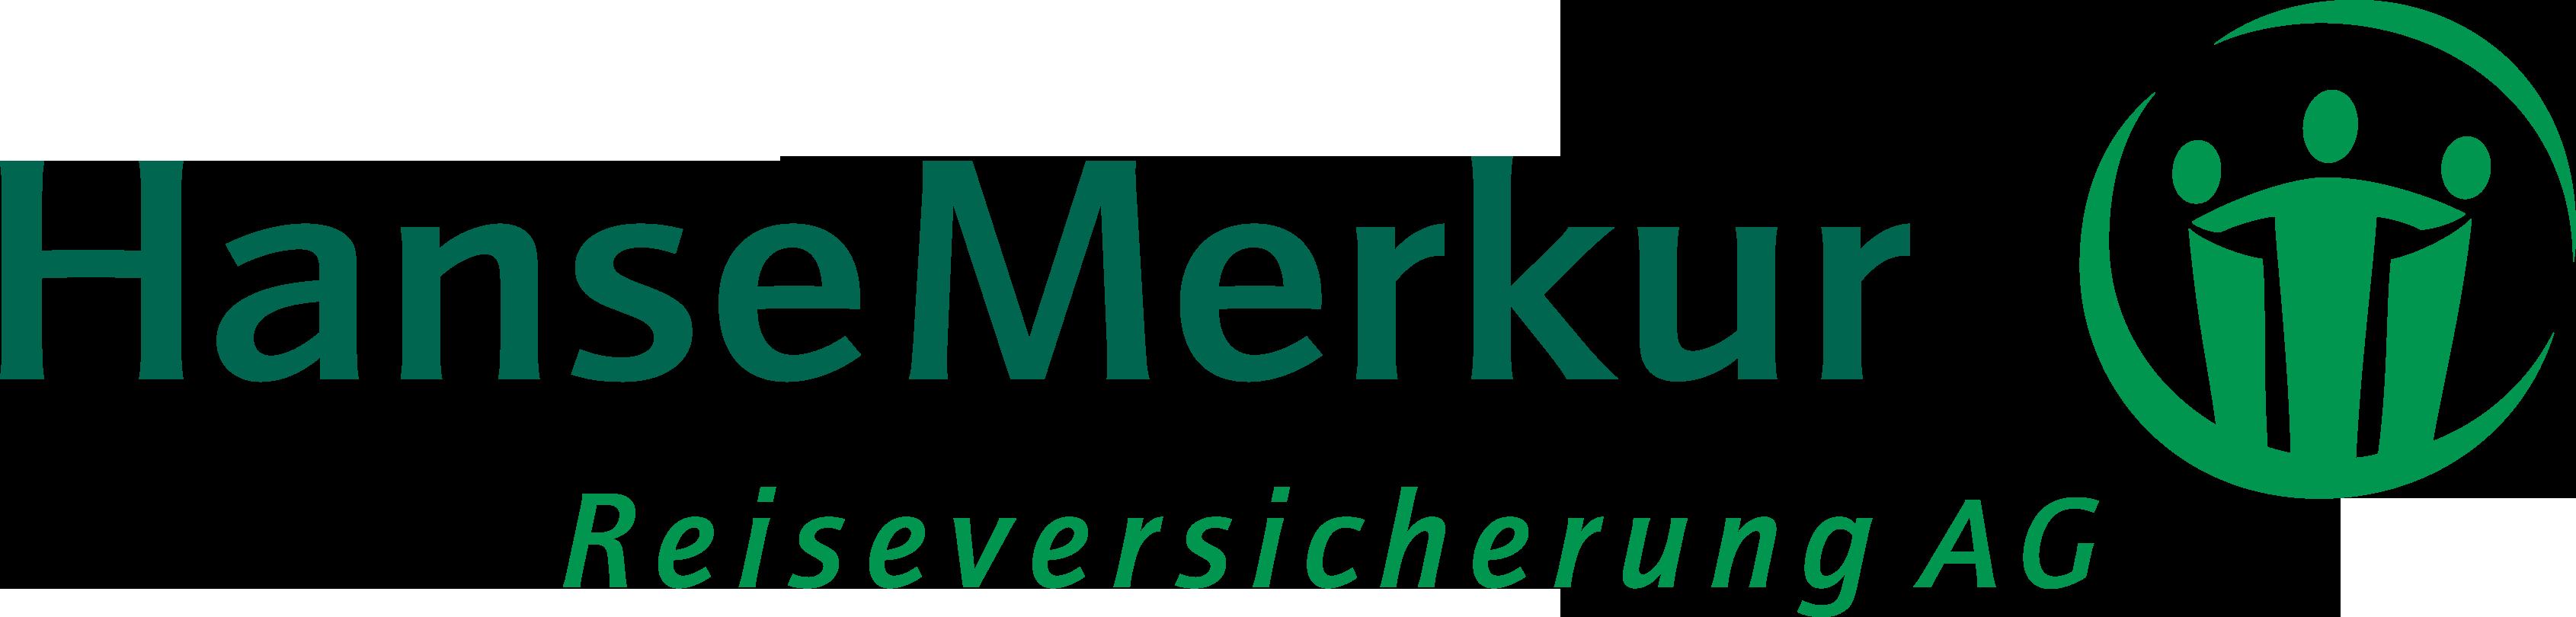 HanseMerkur